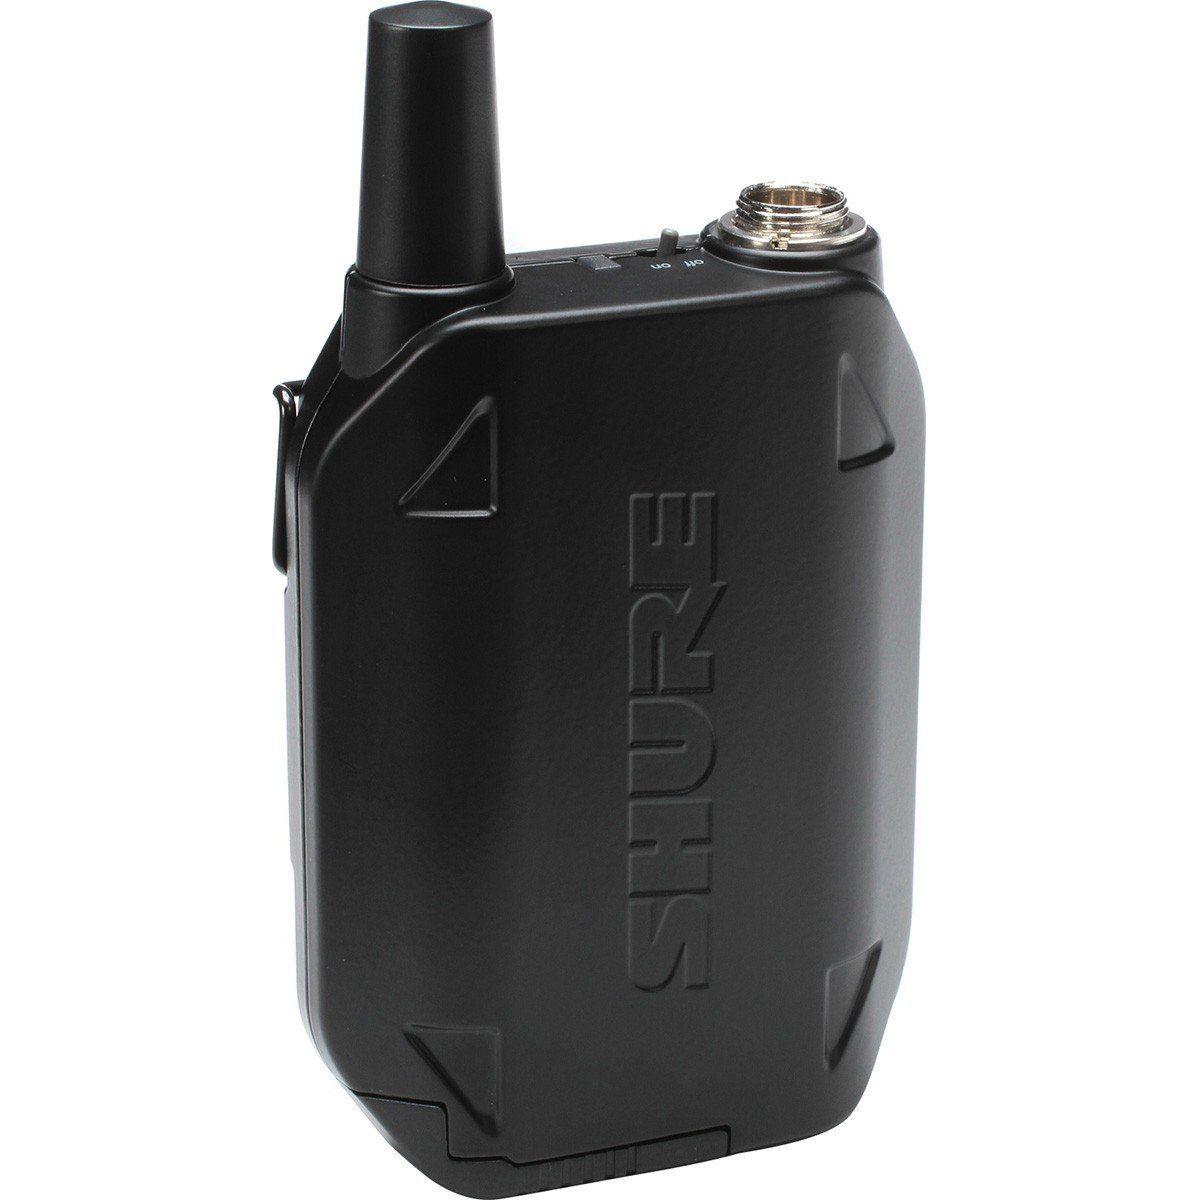 Shure GLXD14/PGA31 Microfone Sem fio Shure GLXD14-PGA31 para Performances ao Vivo